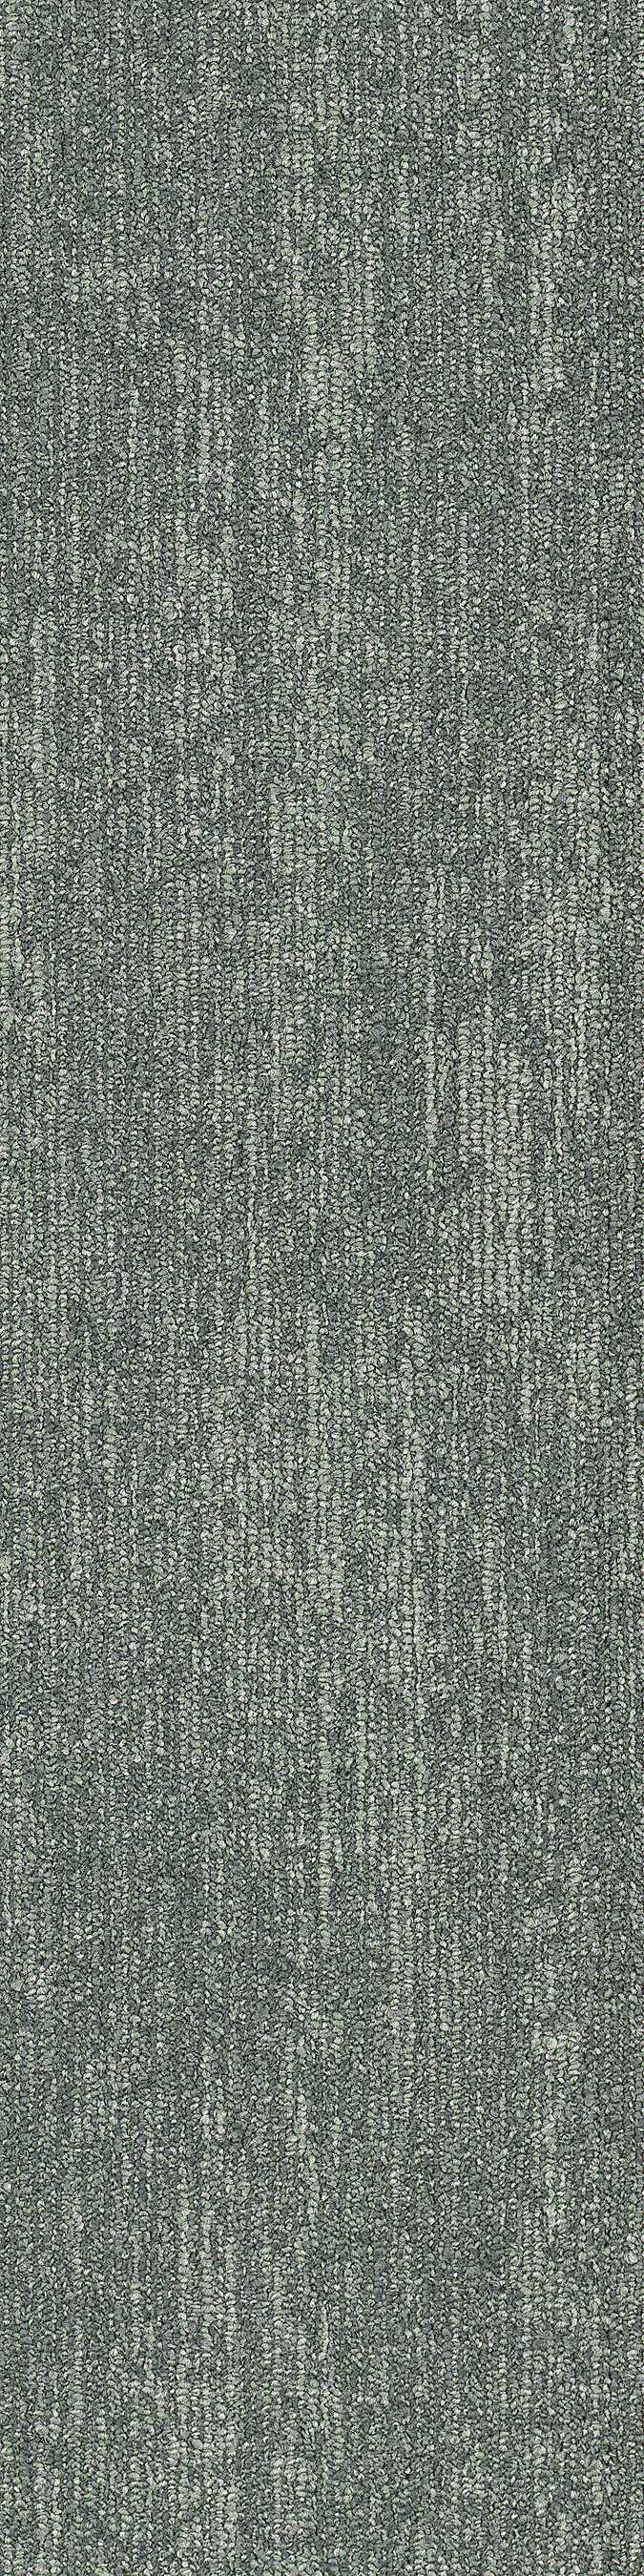 3aae88f1 58e7 4b74 b085 11627cfb4066